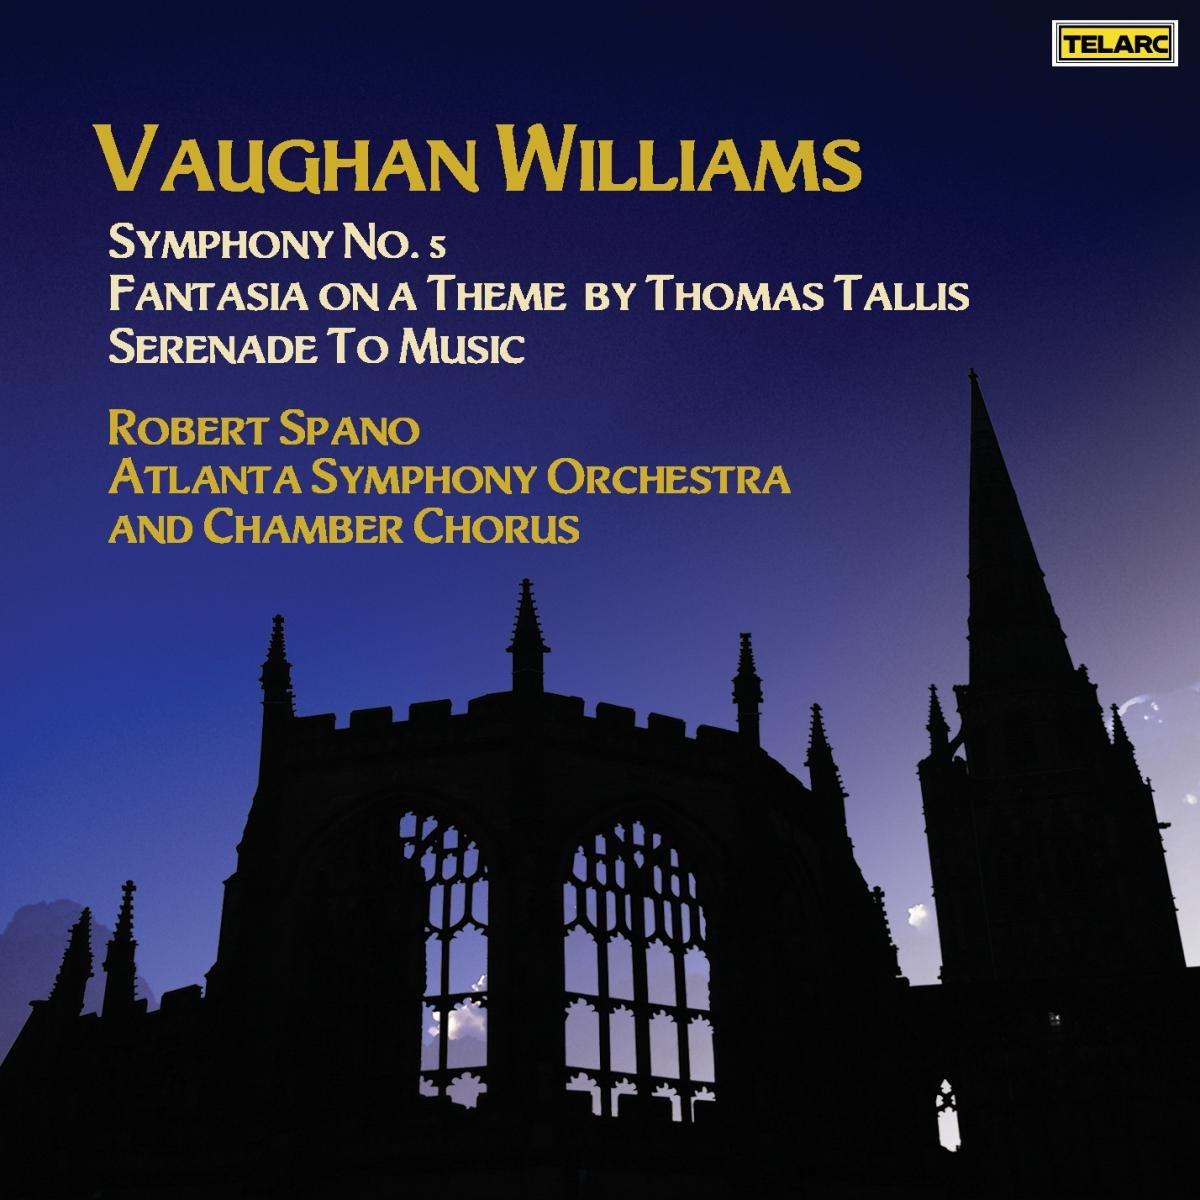 ralph vaughan williams fantasia on a theme by thomas tallis biography